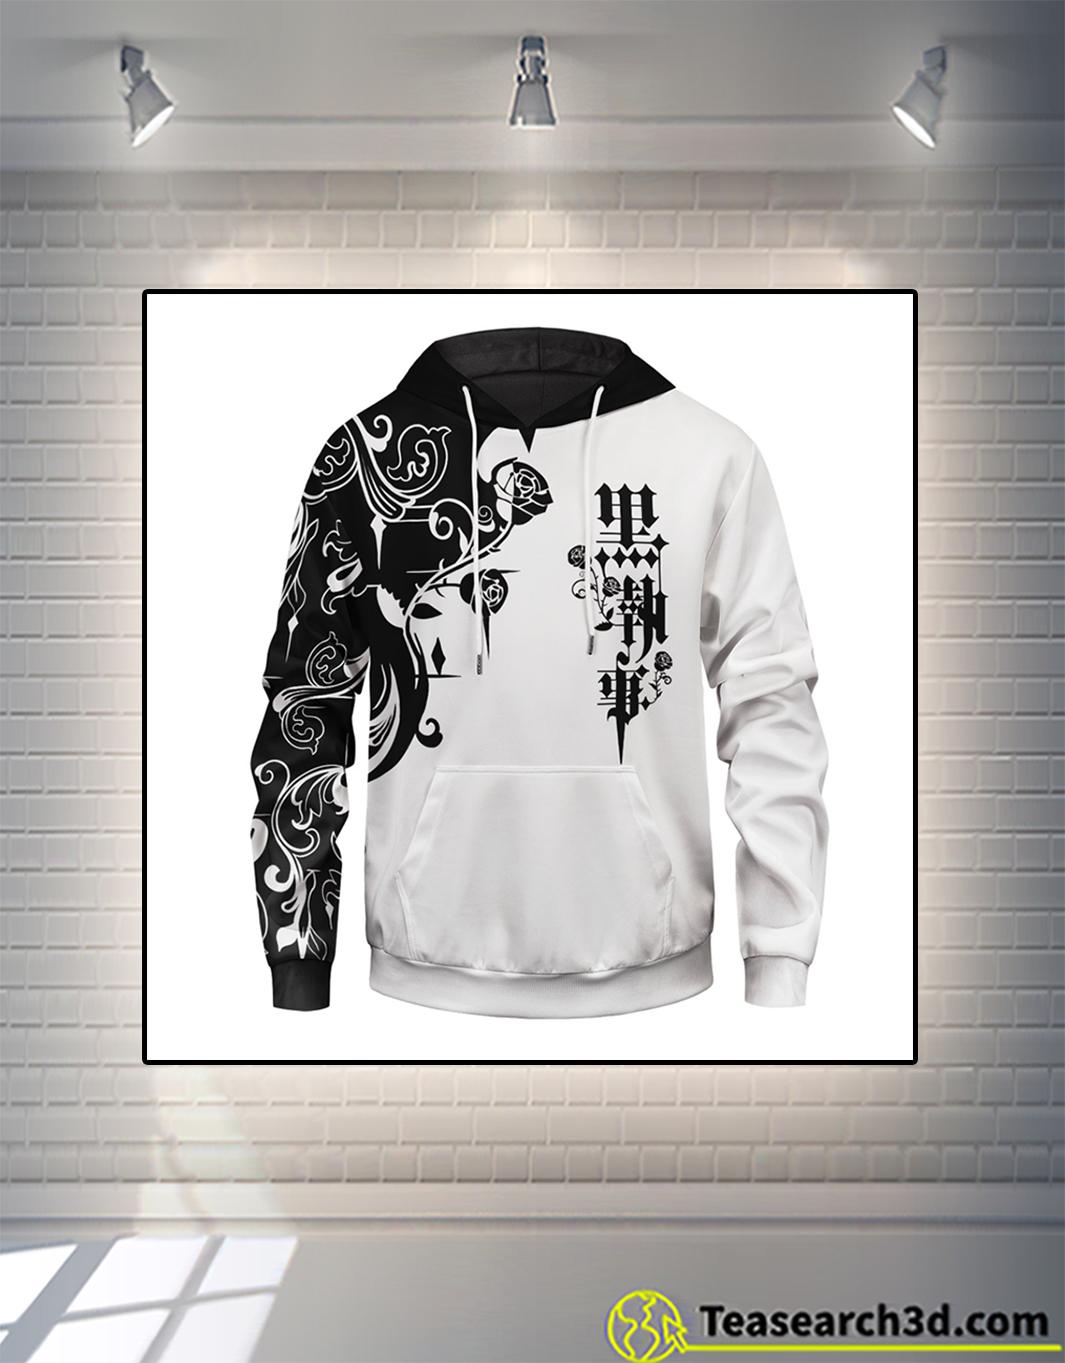 Black butler unisex pullover hoodie front